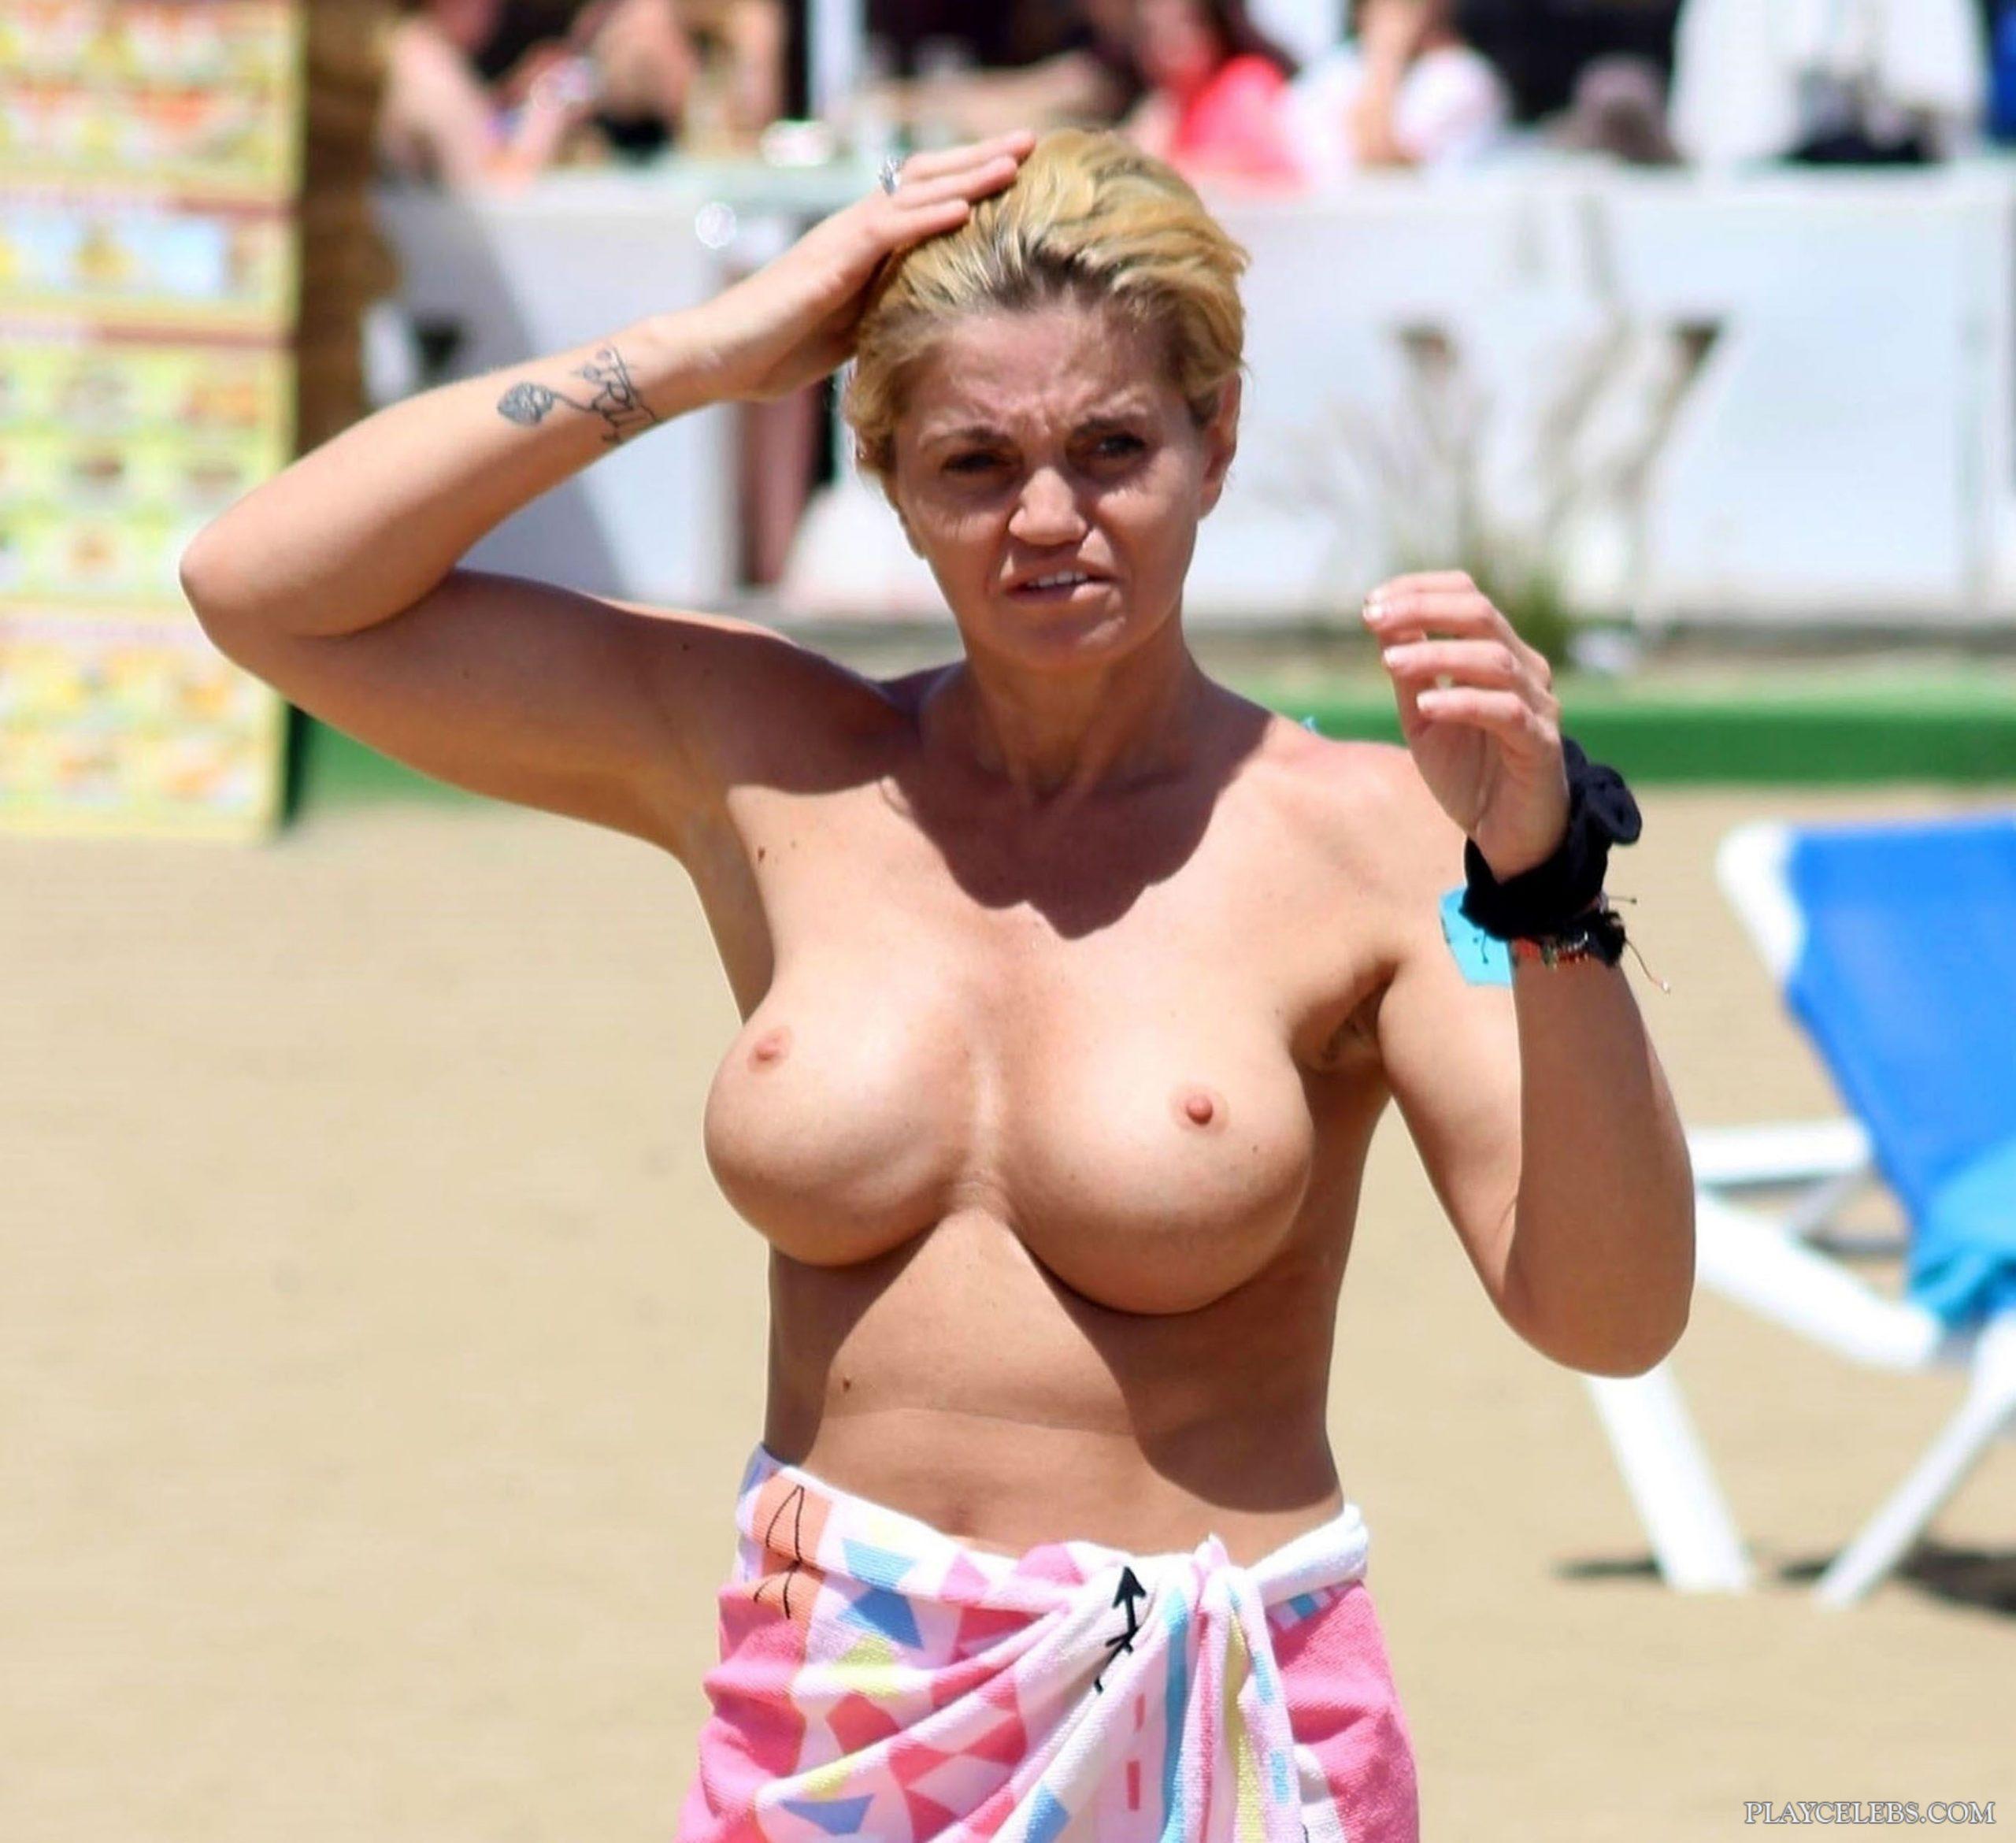 Danniella Westbrook Topless And Thong Bikini On A Beach